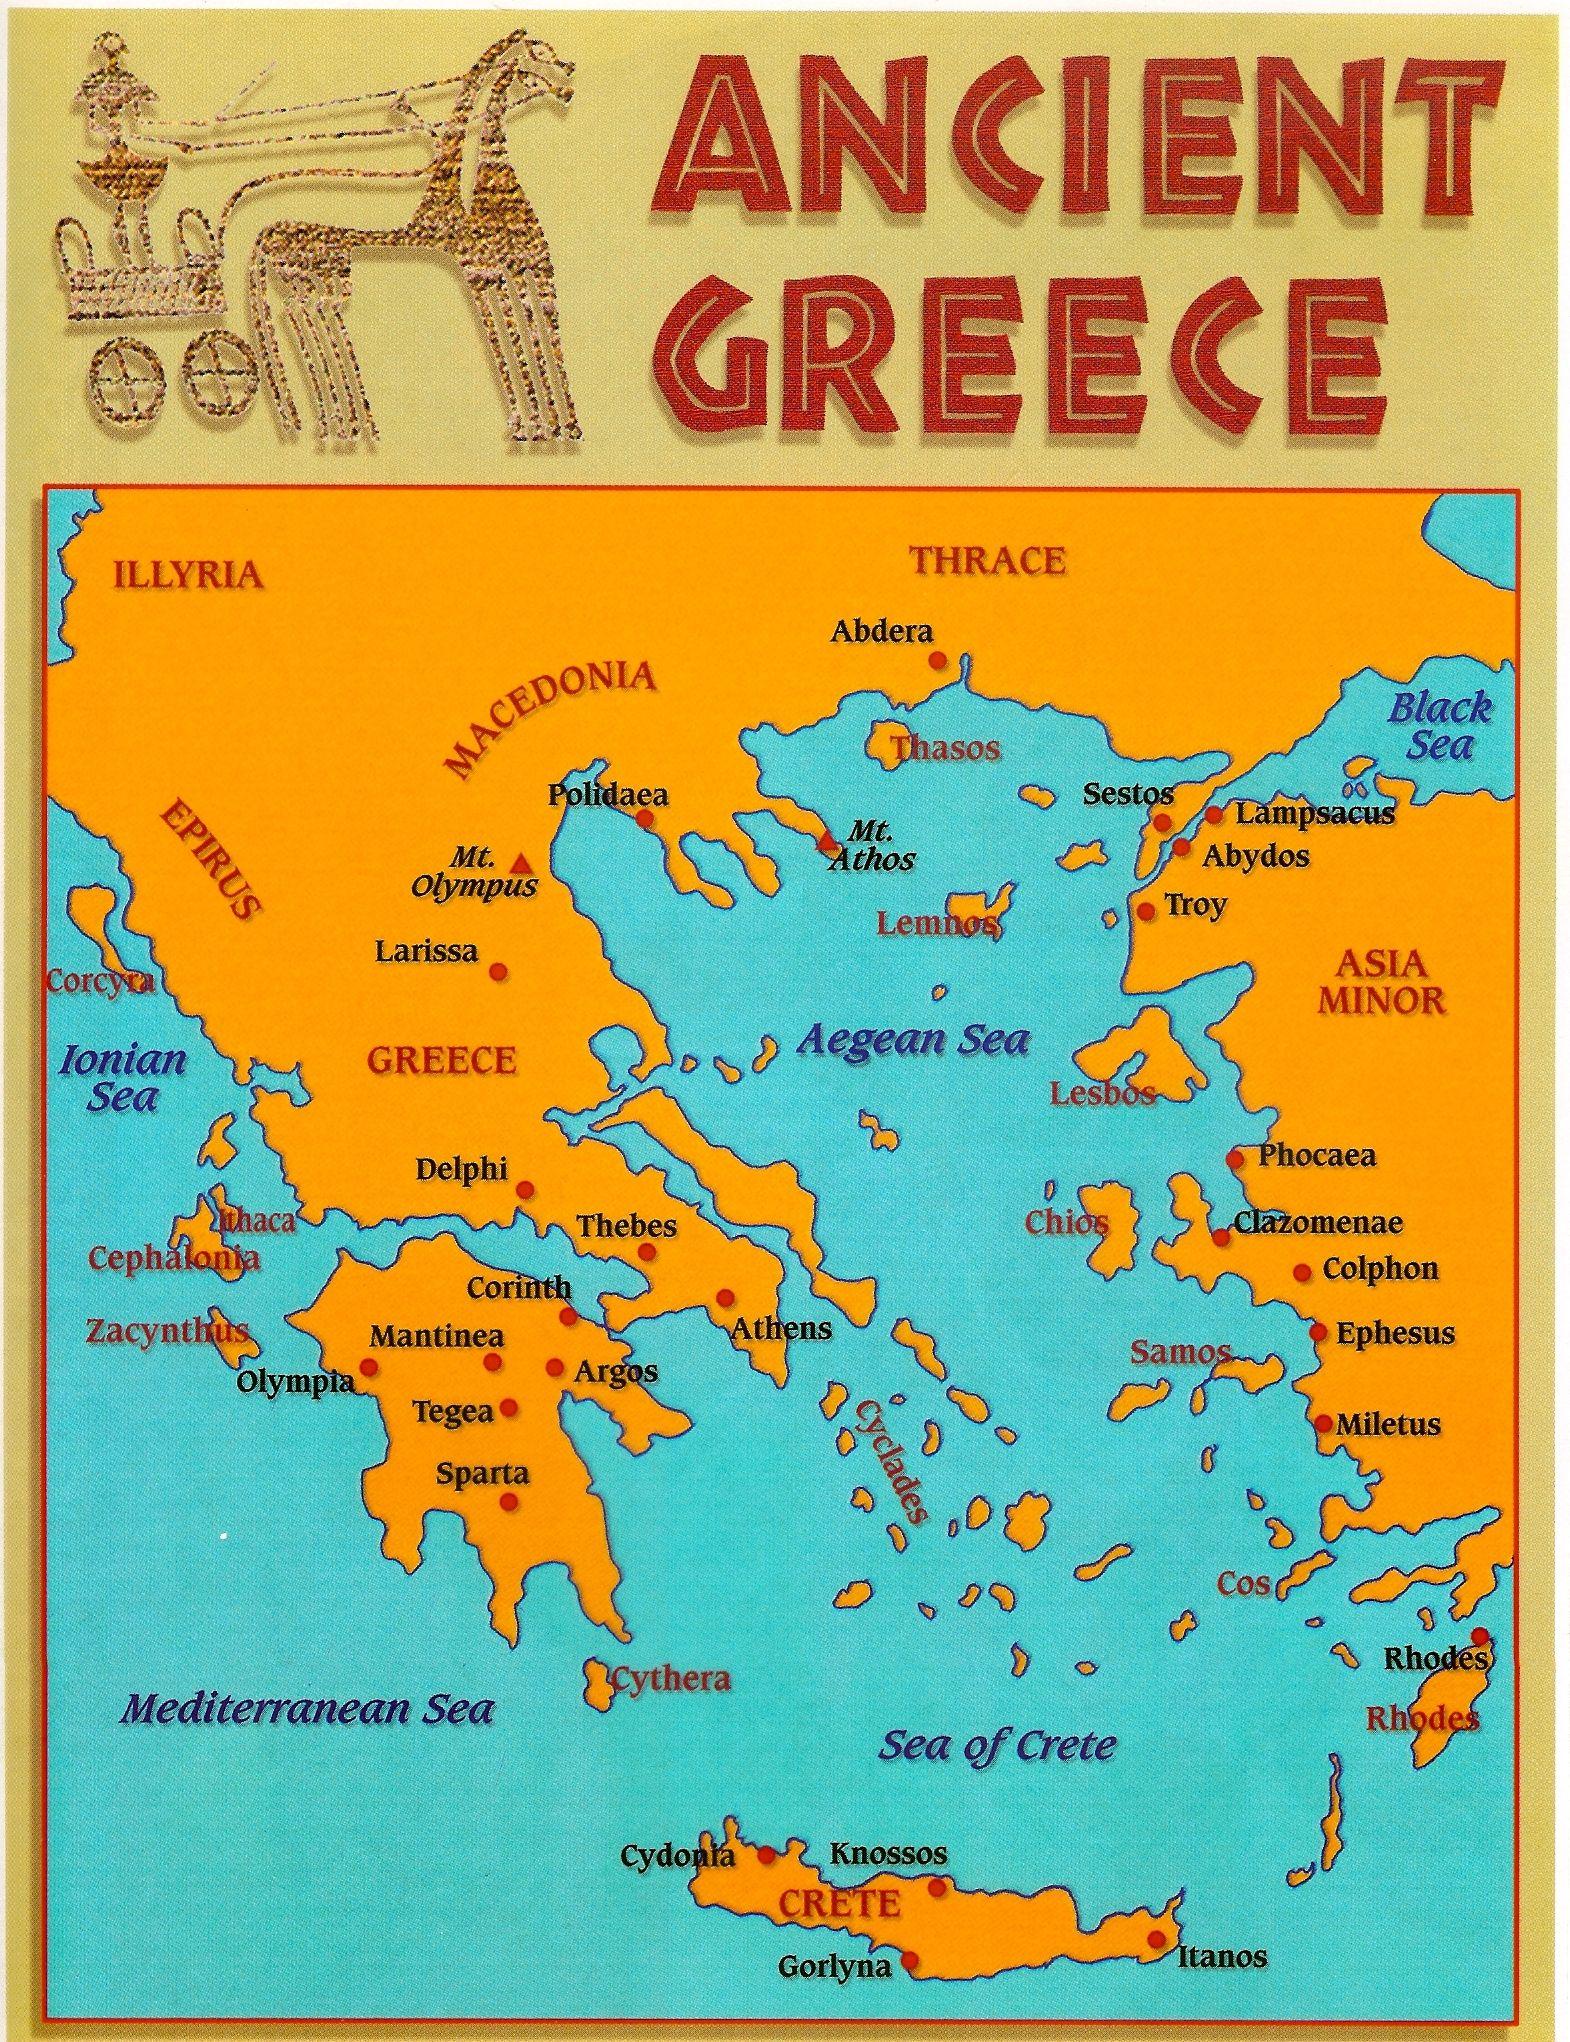 Ancient Greece Map Vs Modern Greece Map